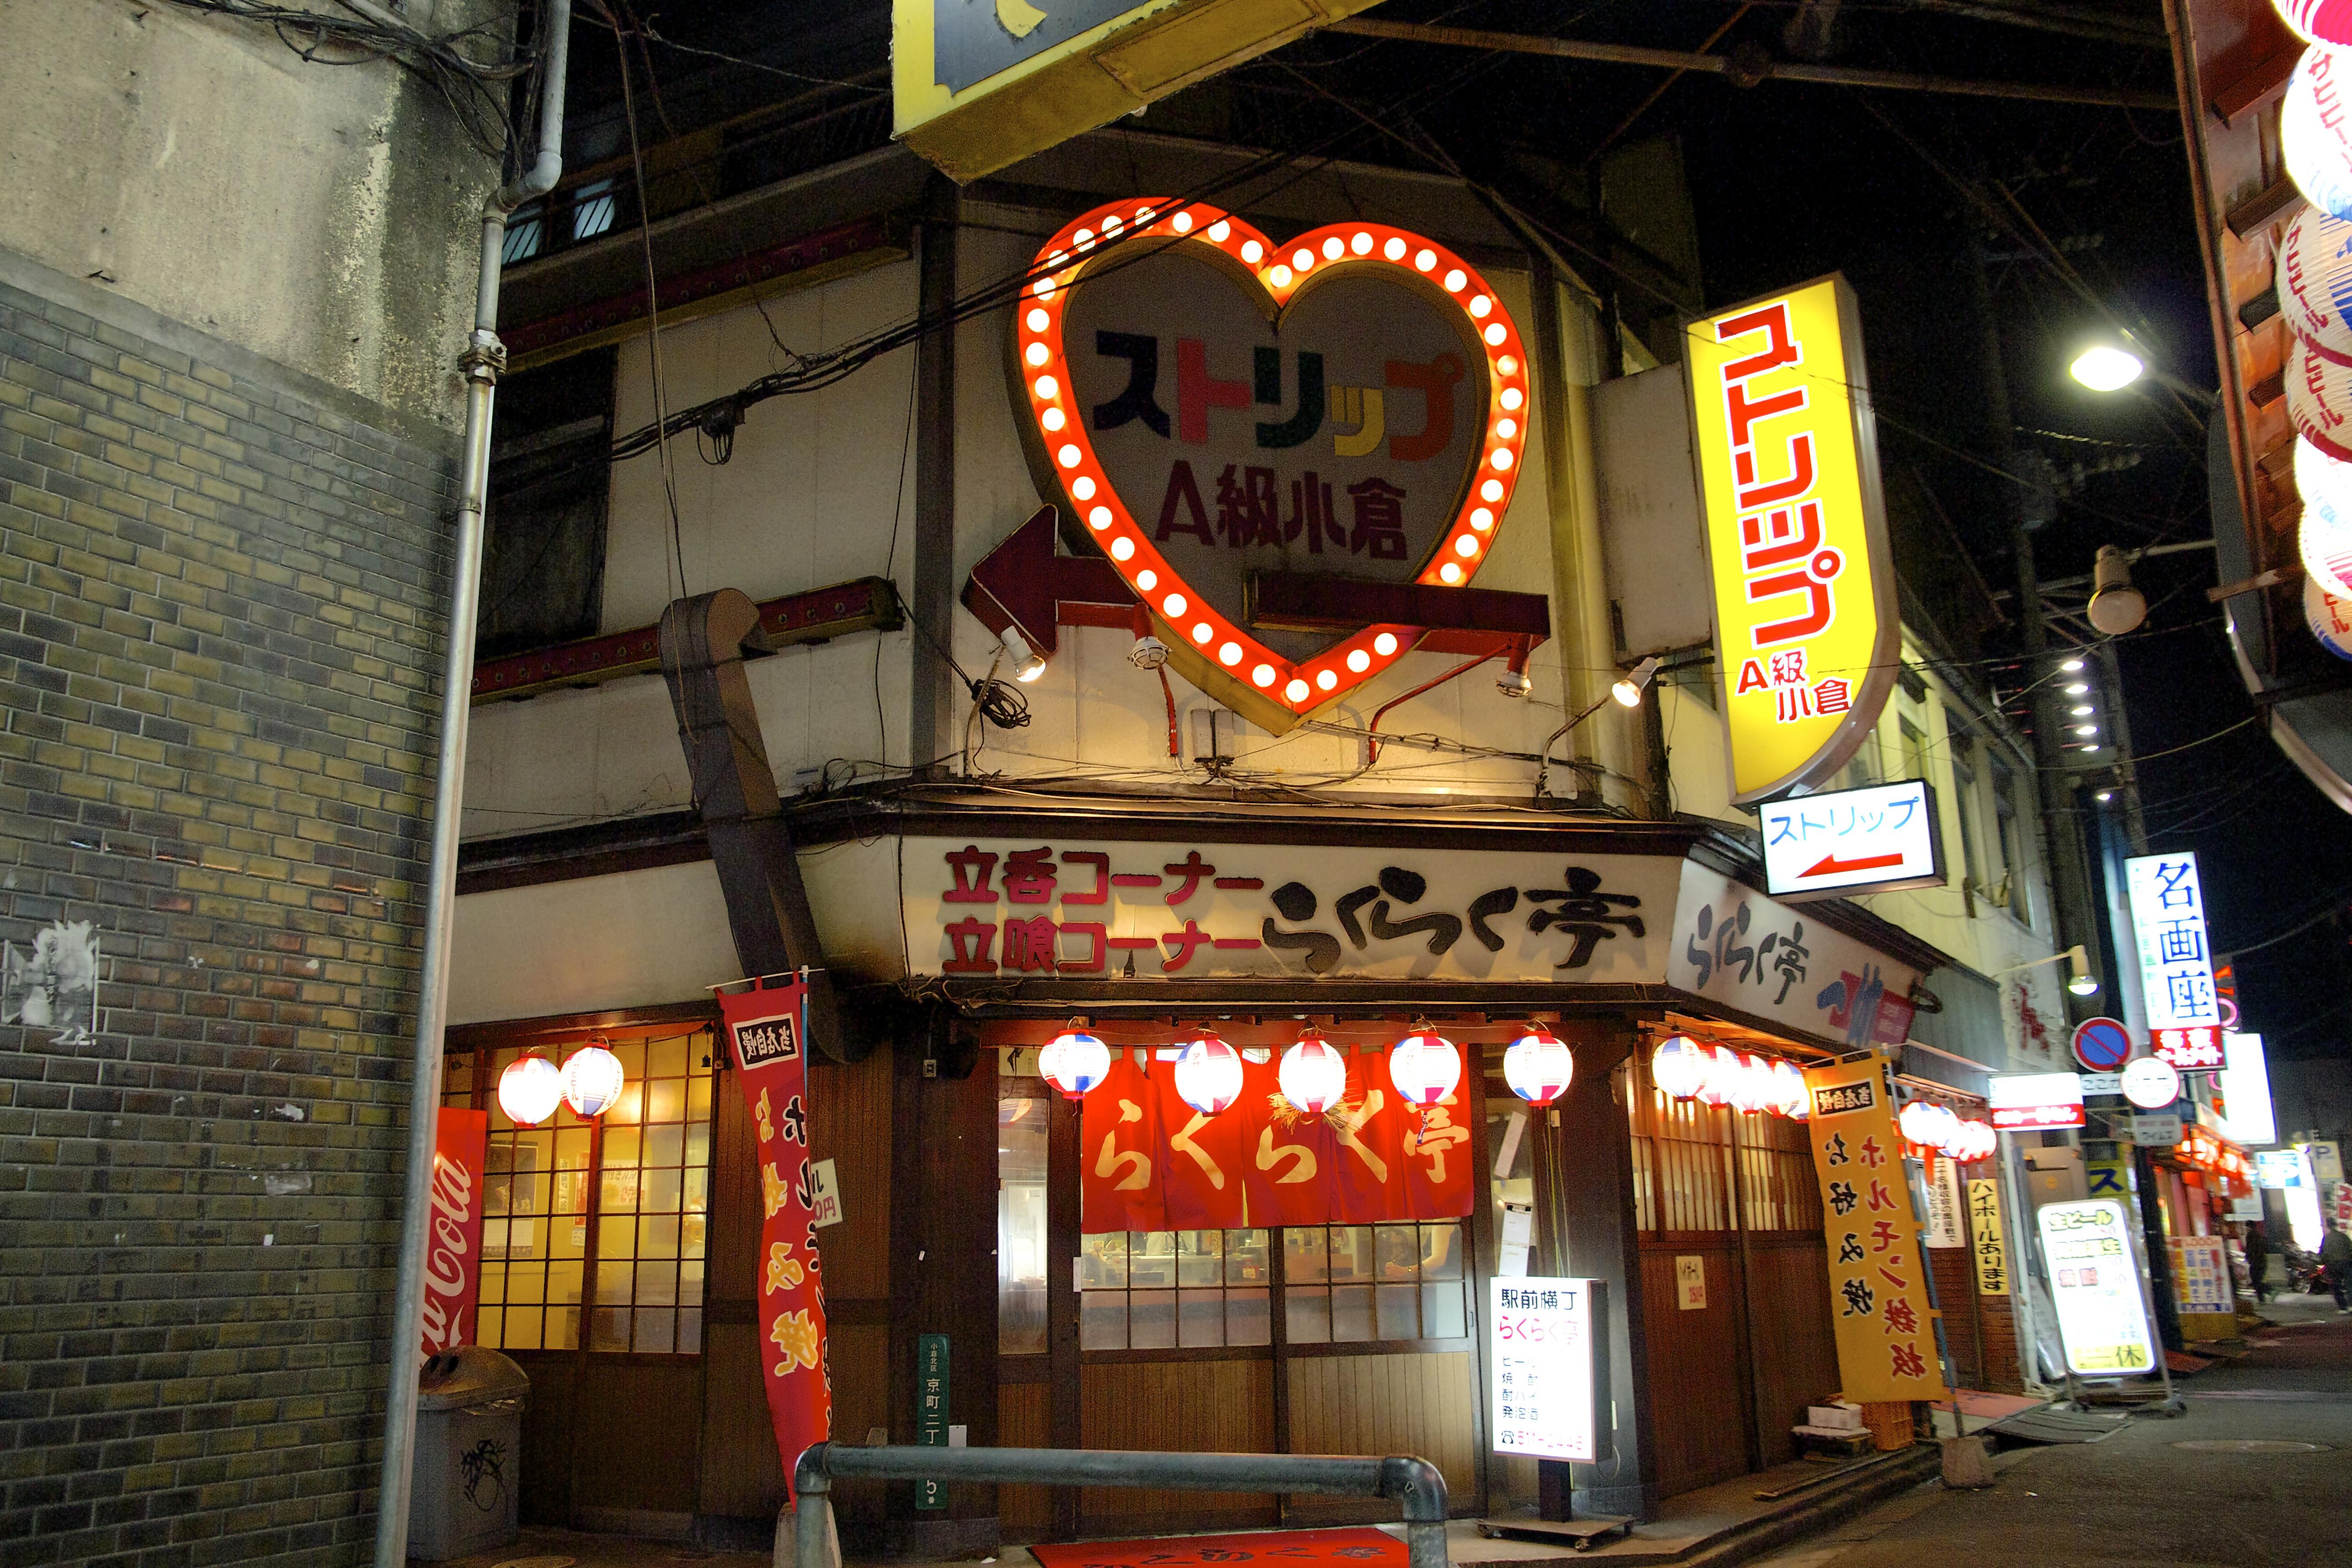 級 劇場 A 小倉